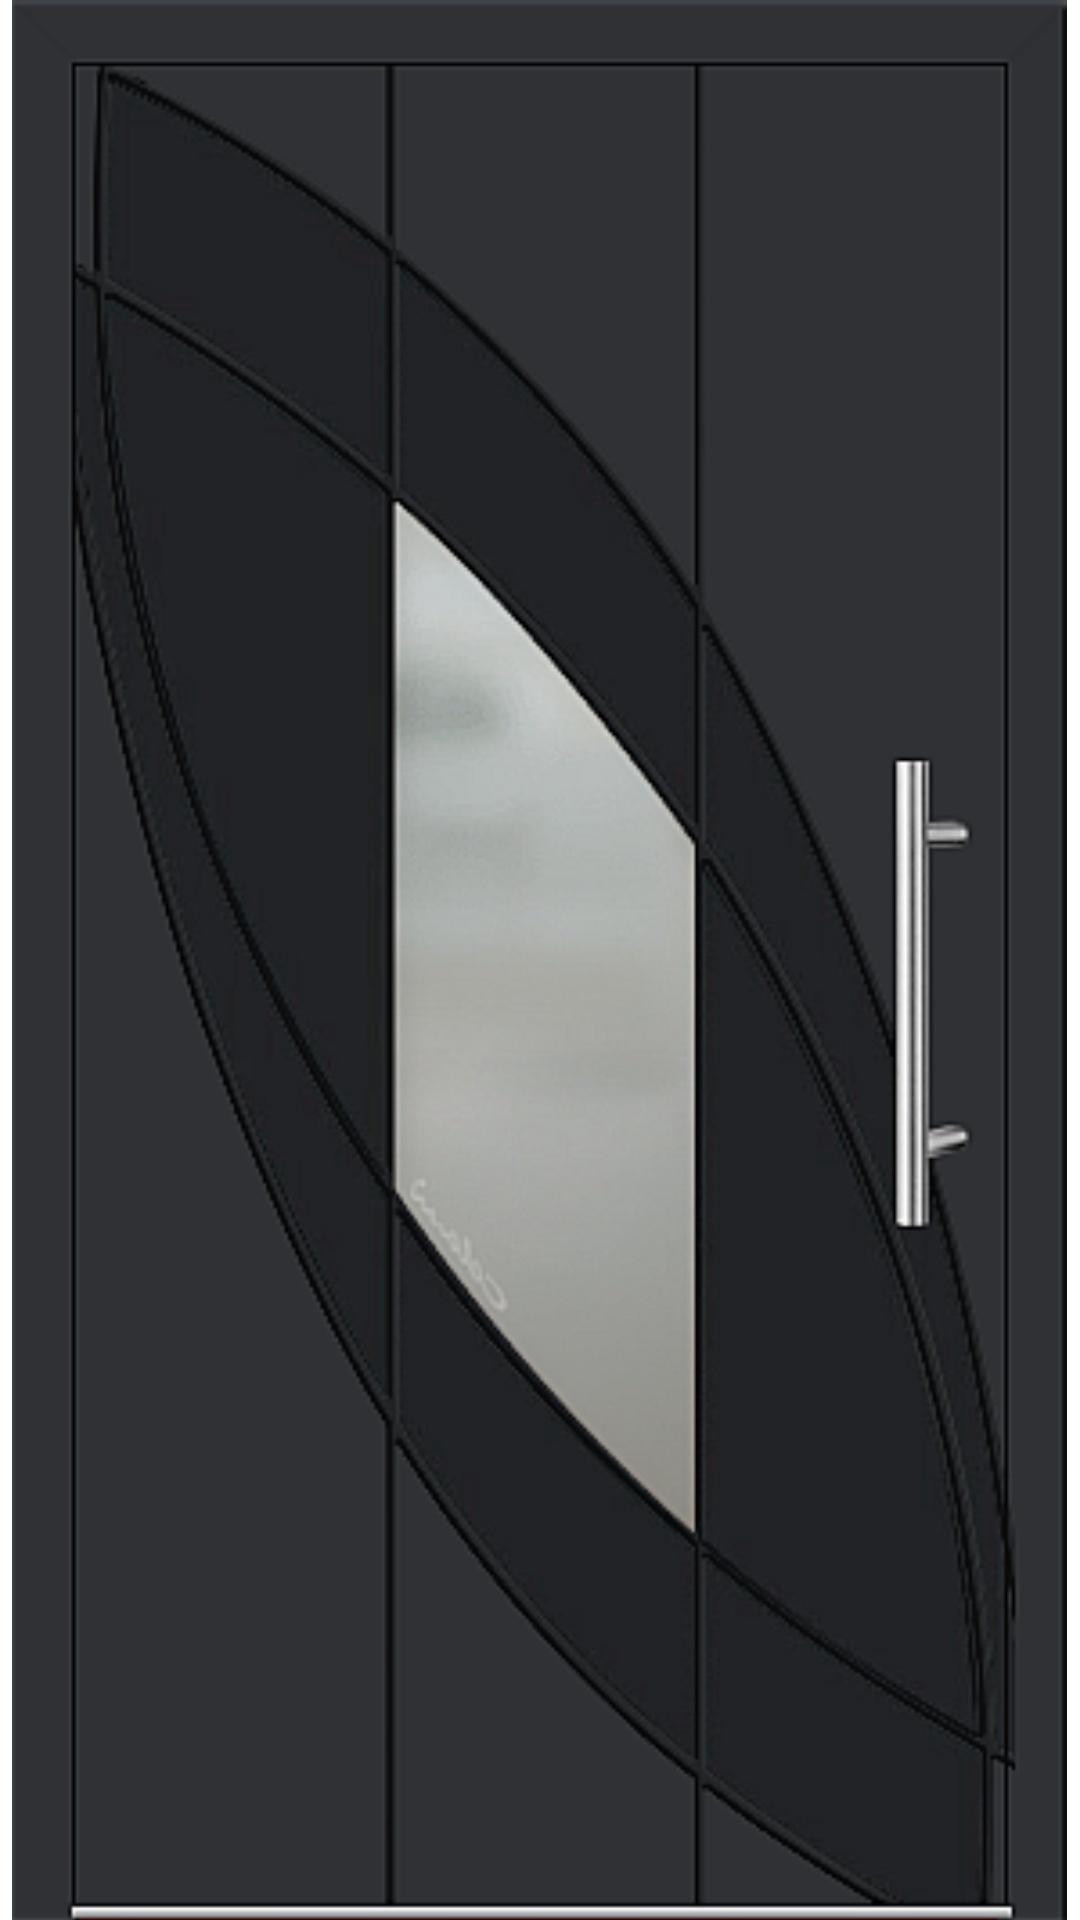 Aluminium Haustür Modell 6999-41 schwarz